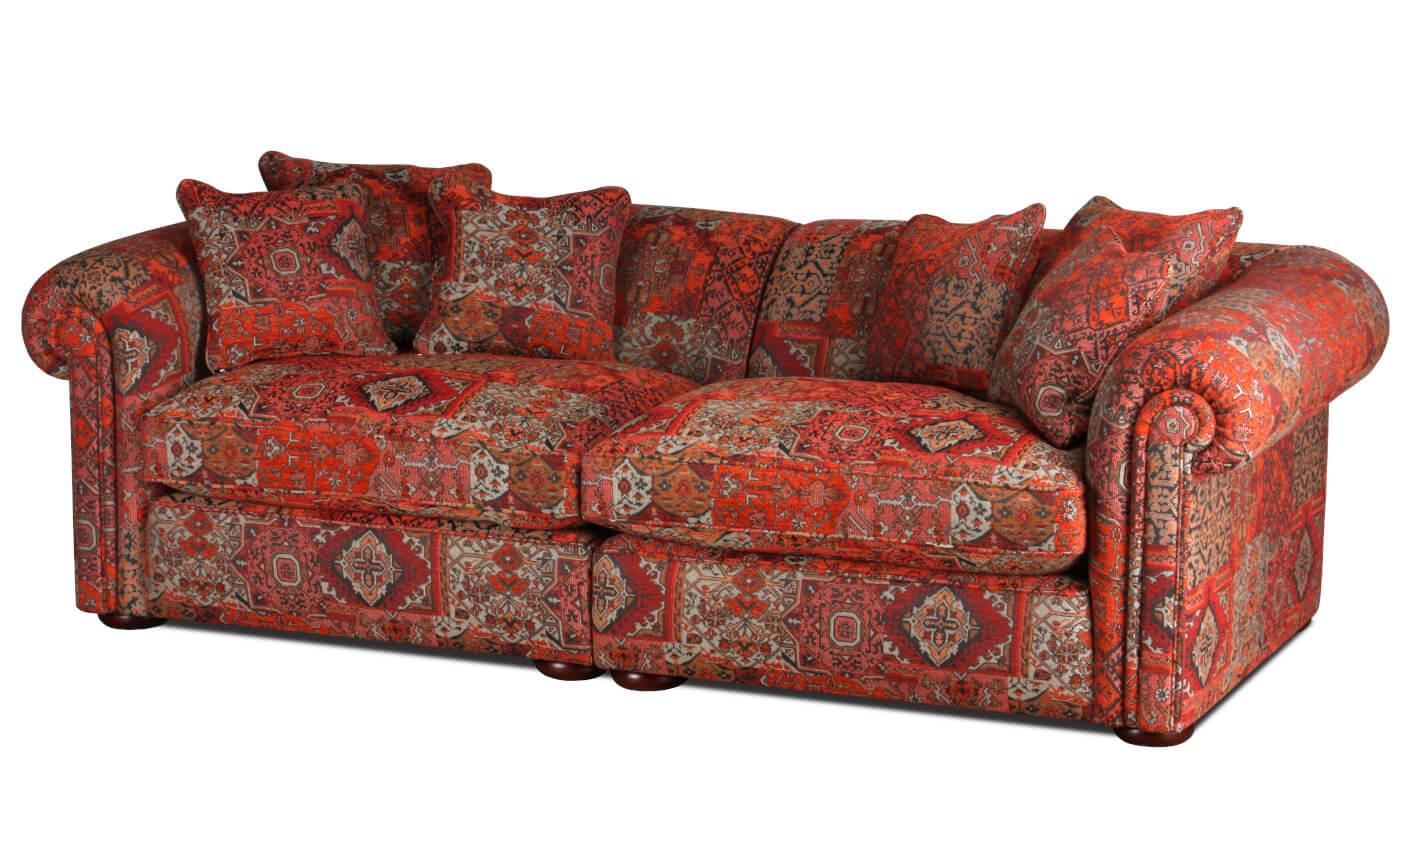 metropolitan sofa im landhausstil mit indira bezugstoff. Black Bedroom Furniture Sets. Home Design Ideas